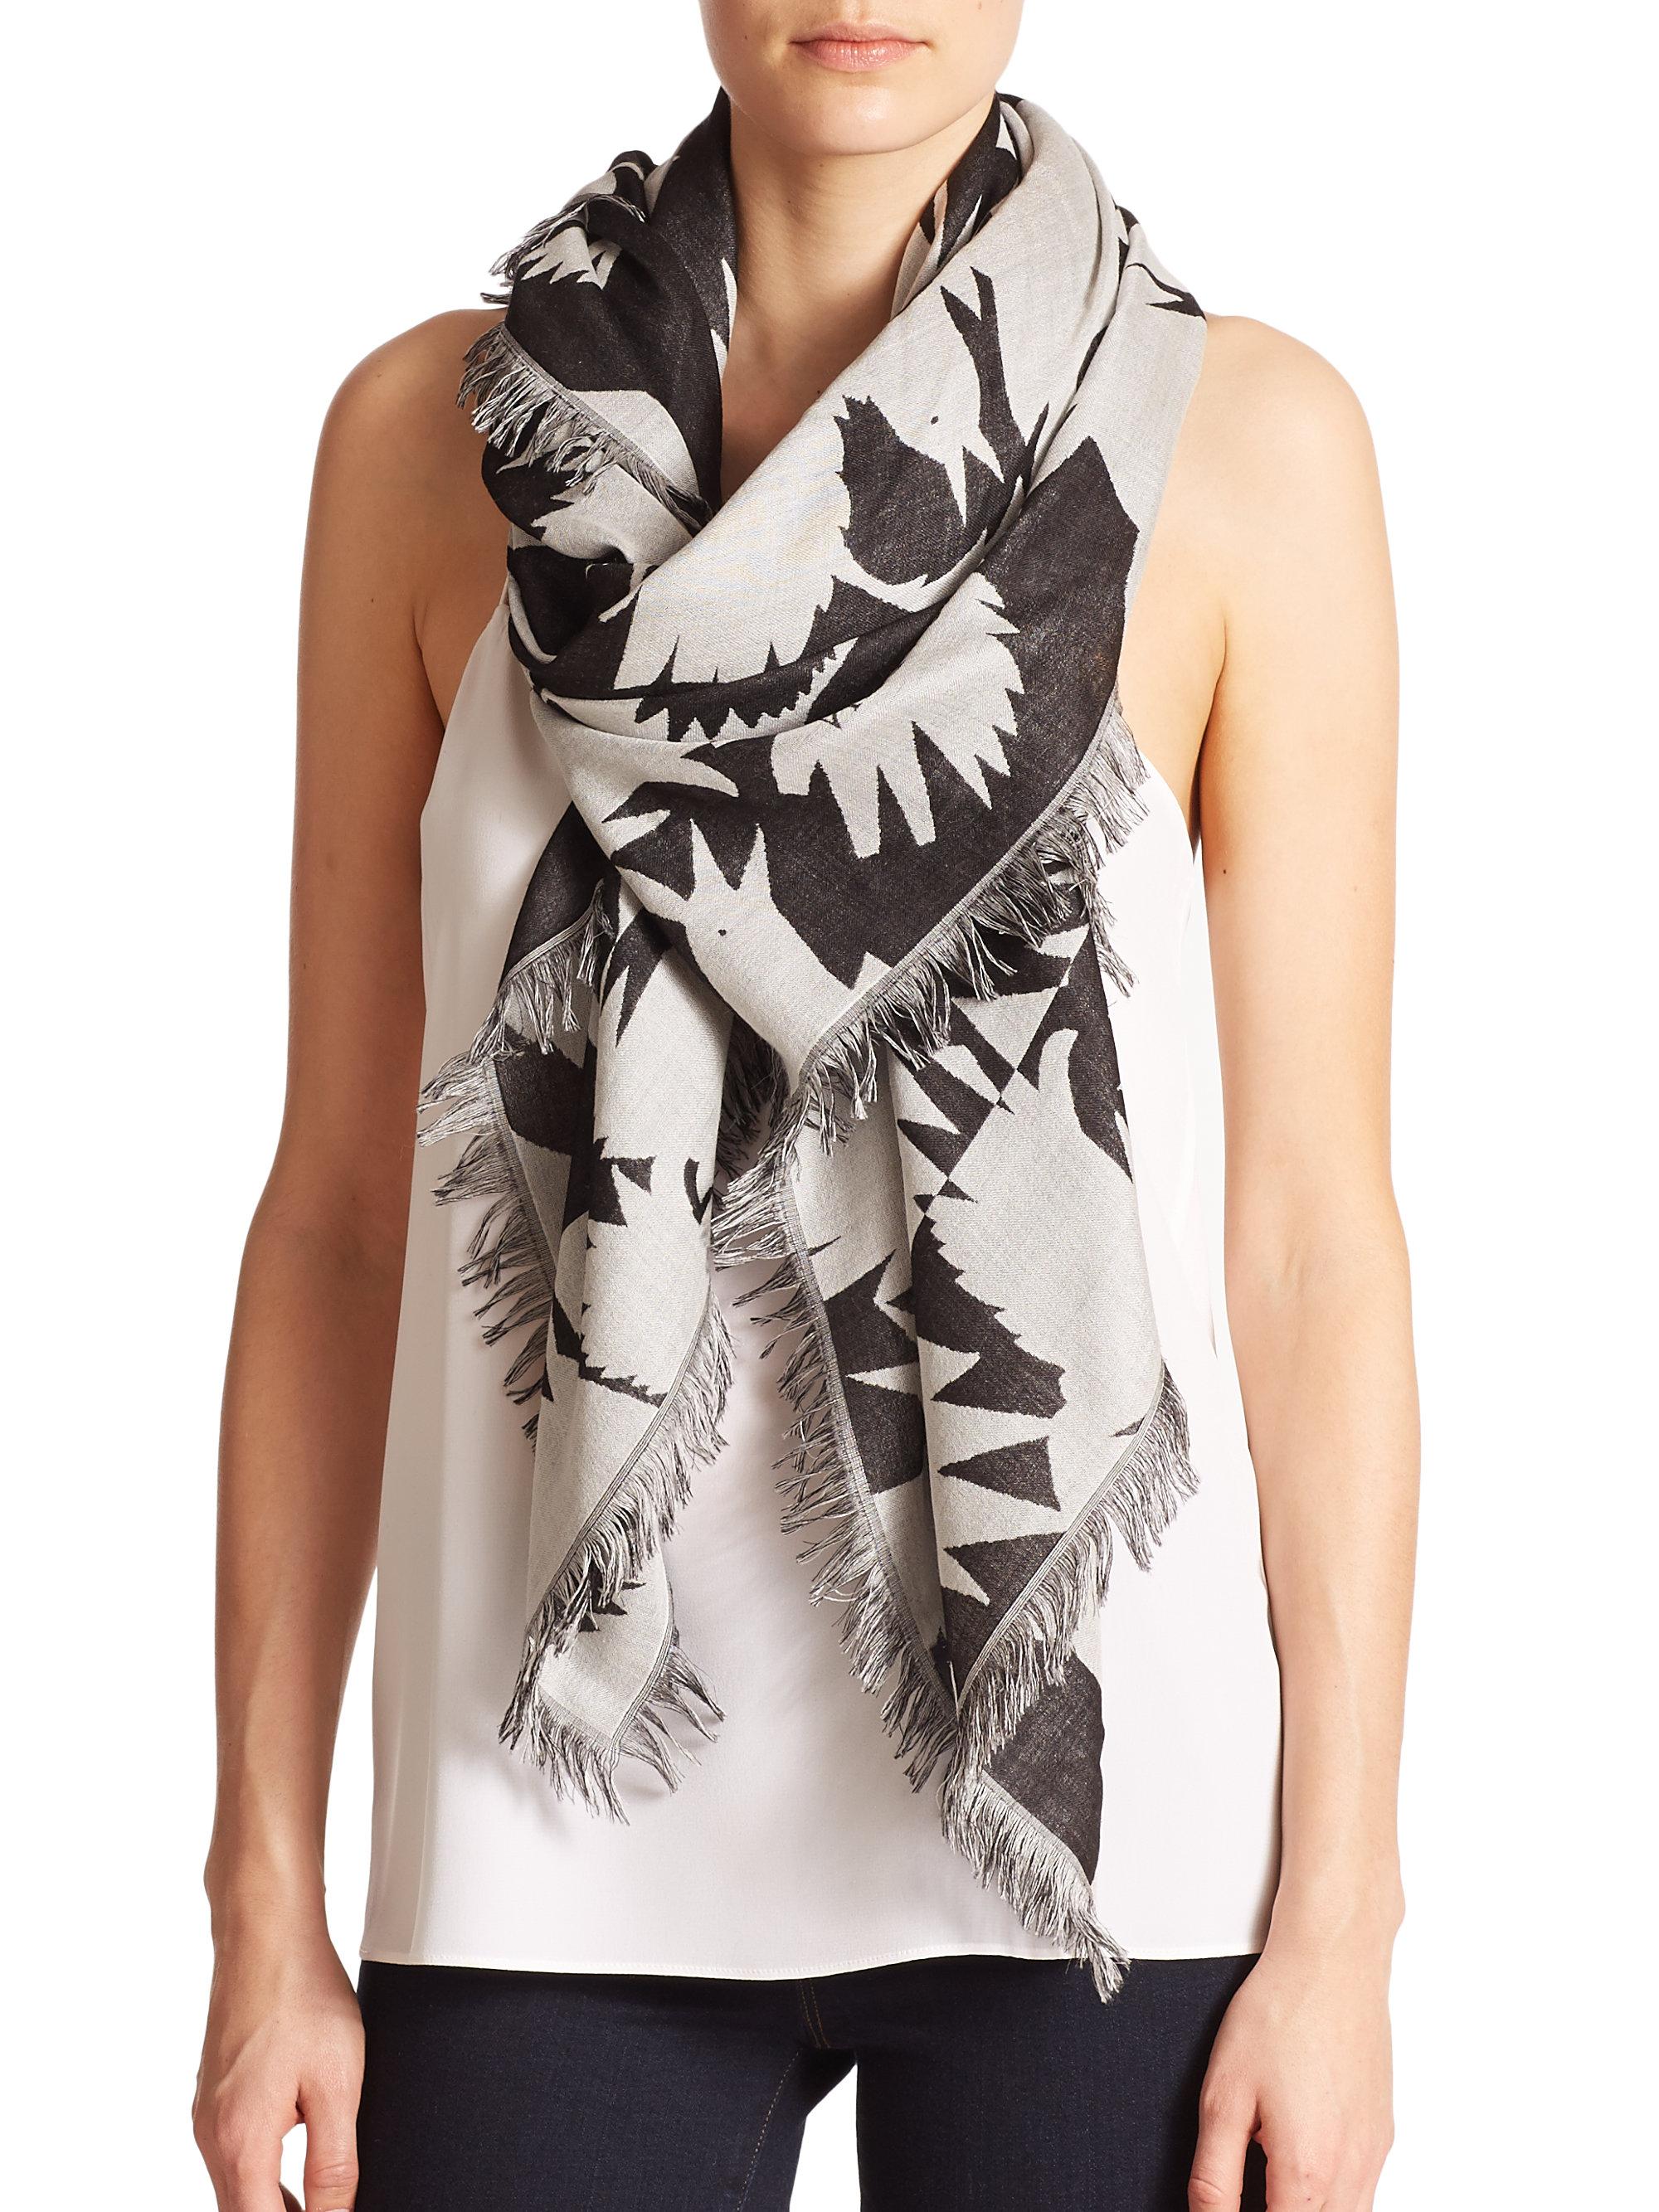 birds printed scarf - Green Alexander McQueen 8gwJJ2iCi